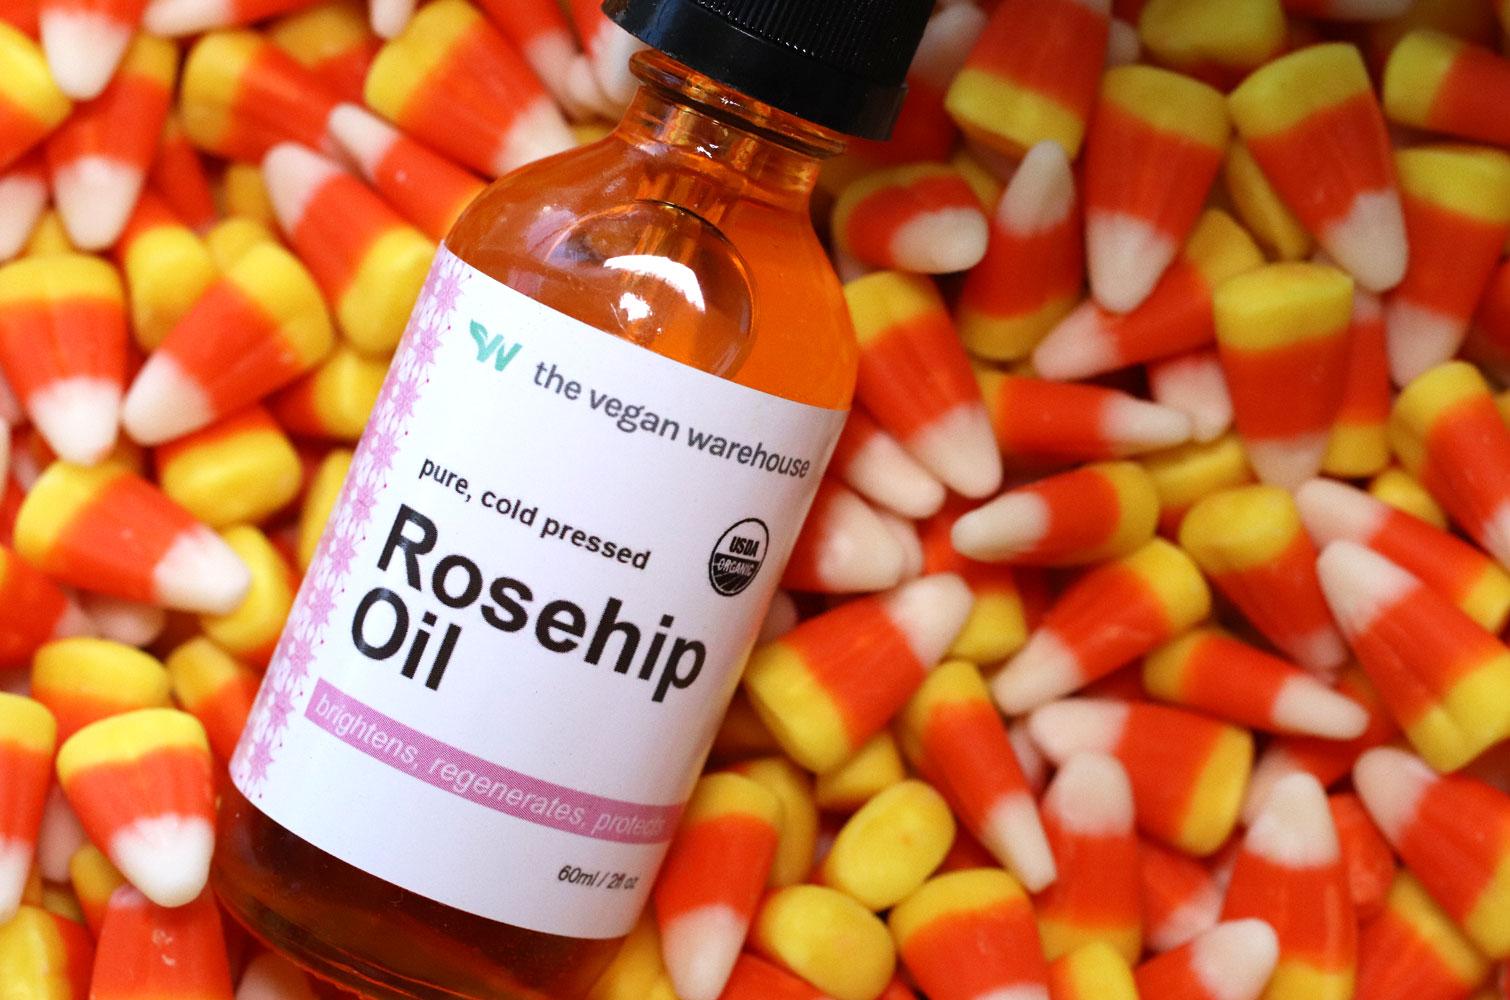 Giveaway - Vegan organic rosehip oil from The Vegan Warehouse